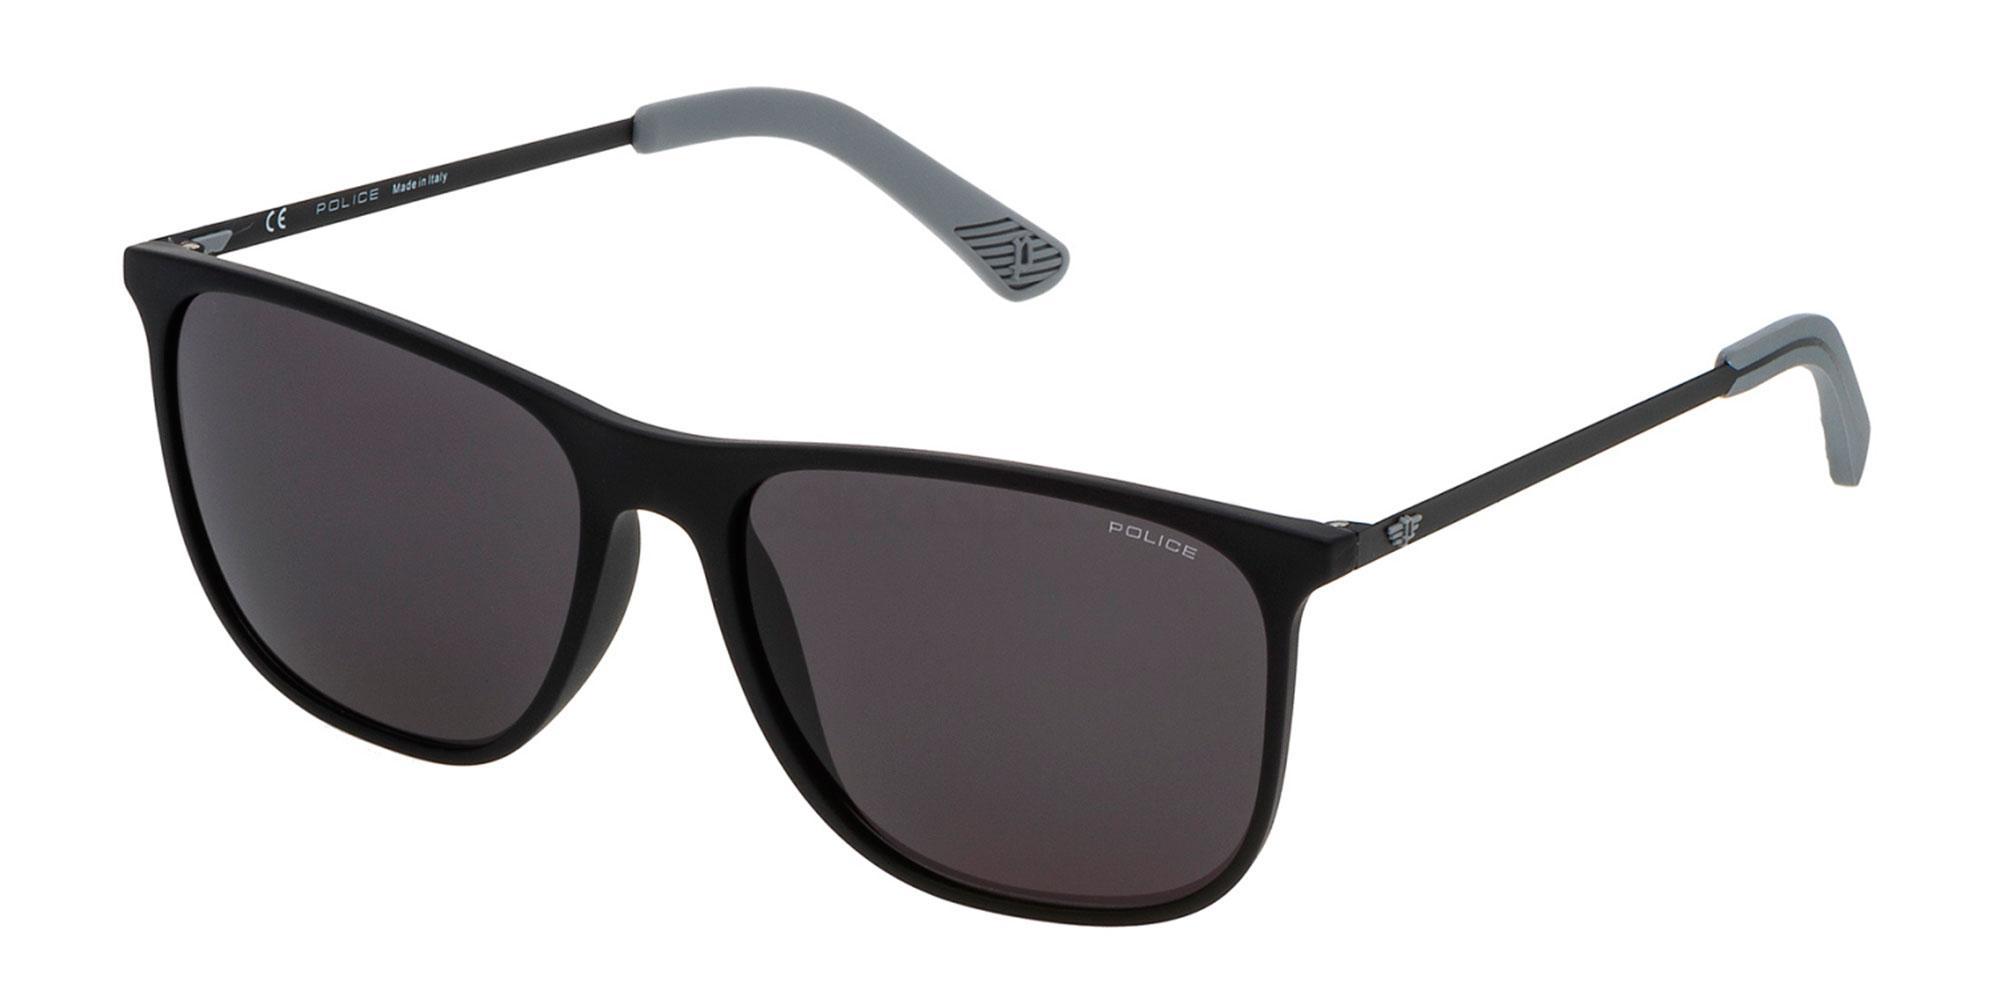 6AAF SPL567 Sunglasses, Police